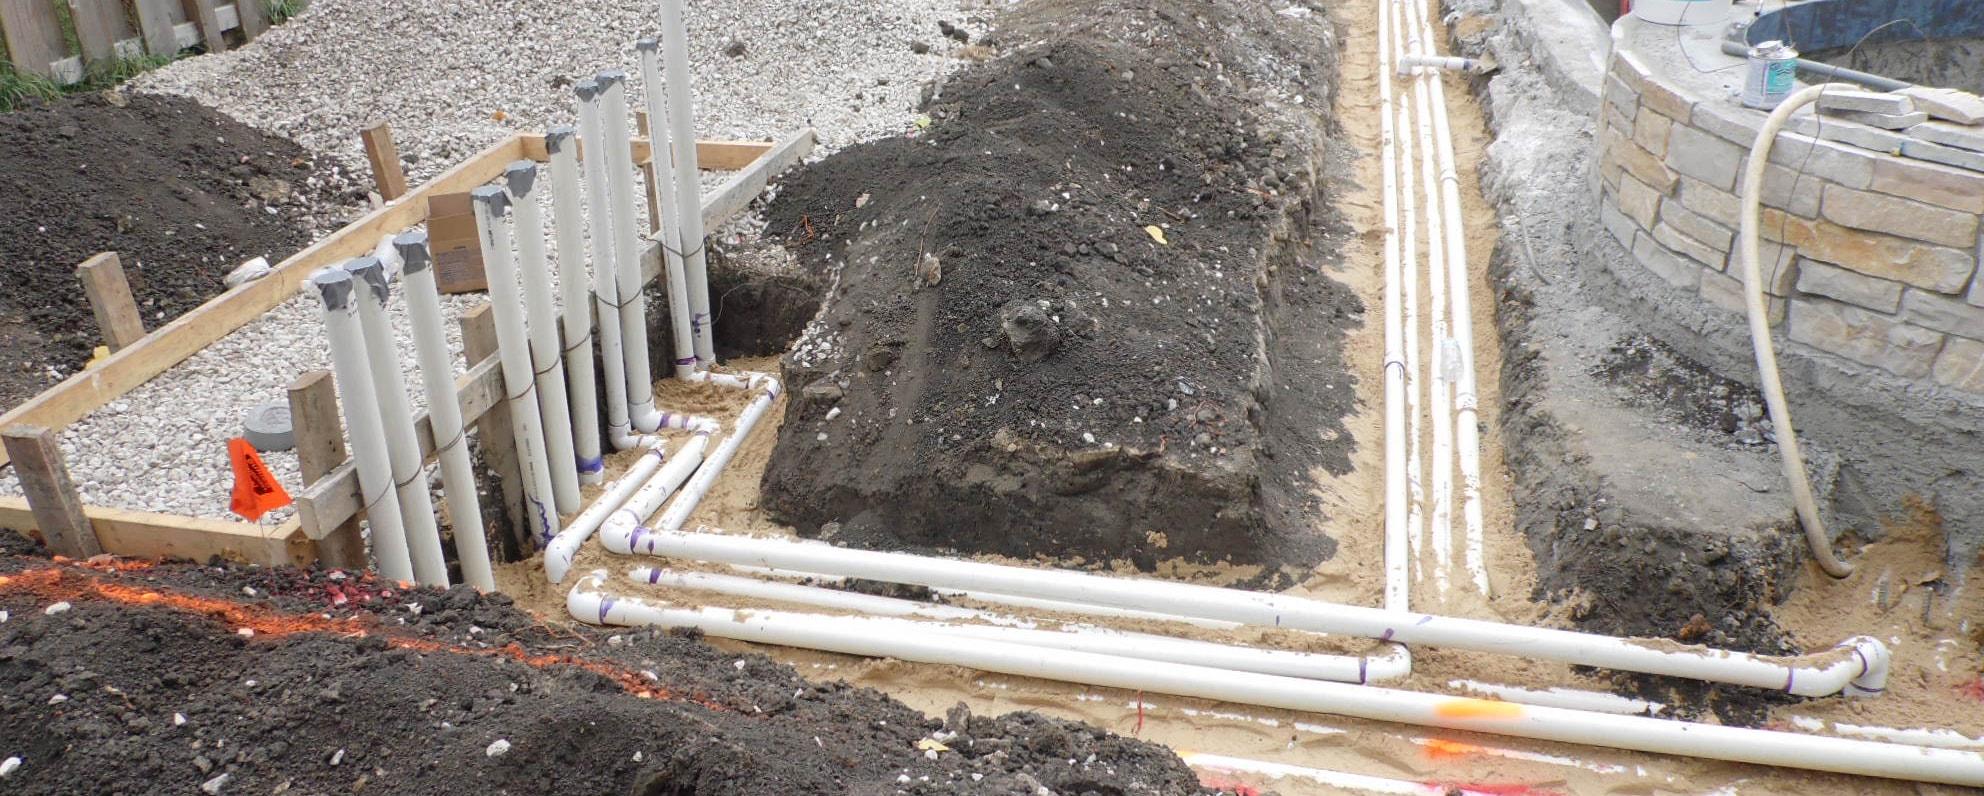 Pvc Pool Plumbing : Swimming pool plumbing and electrical danna pools inc